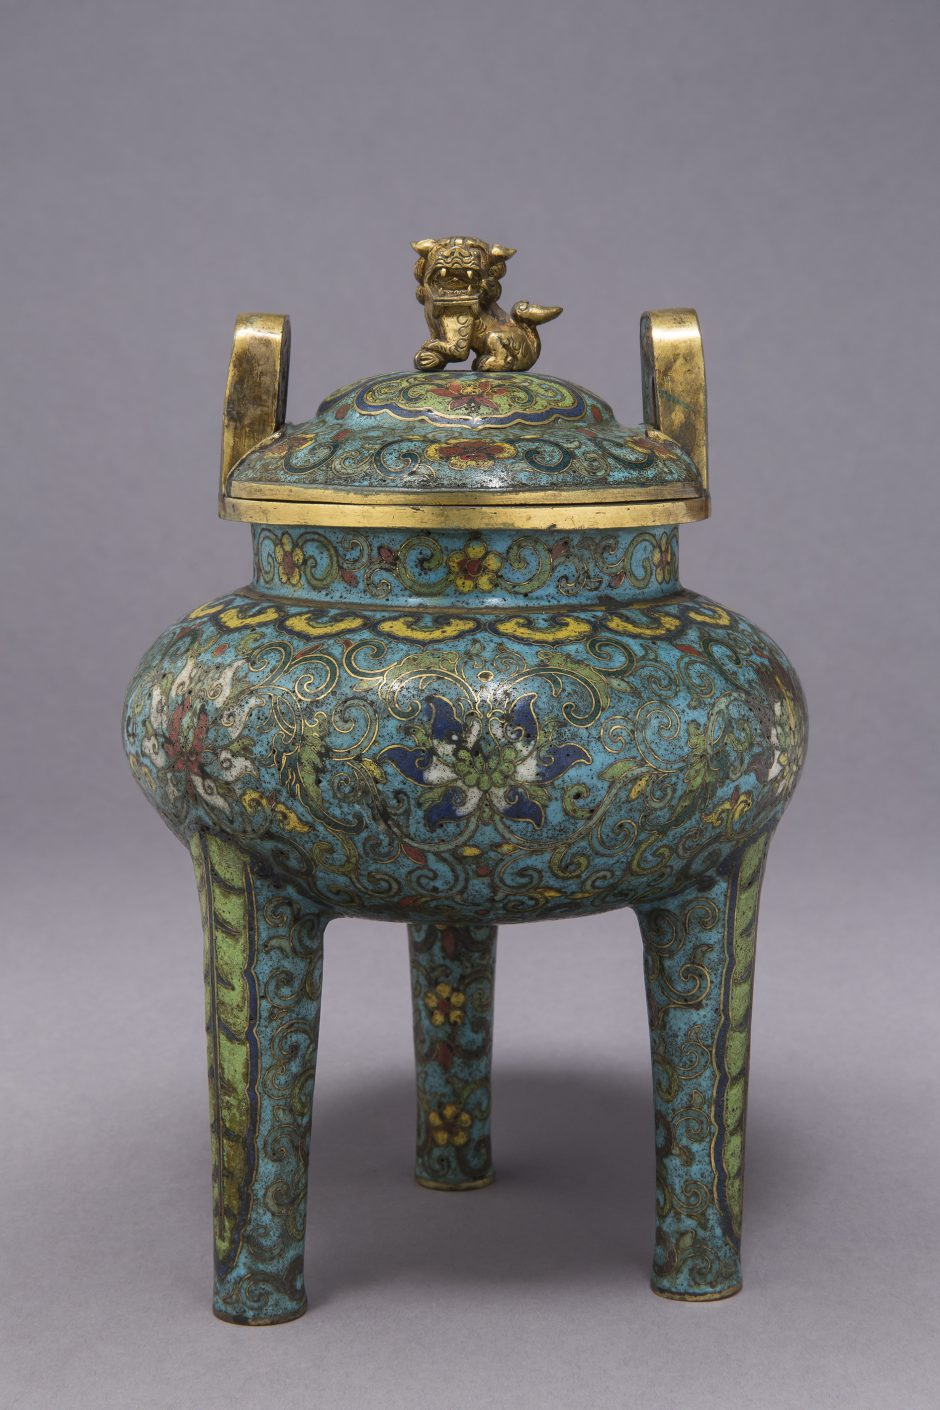 Unknown artist, incense burner, enamelled, 18th century